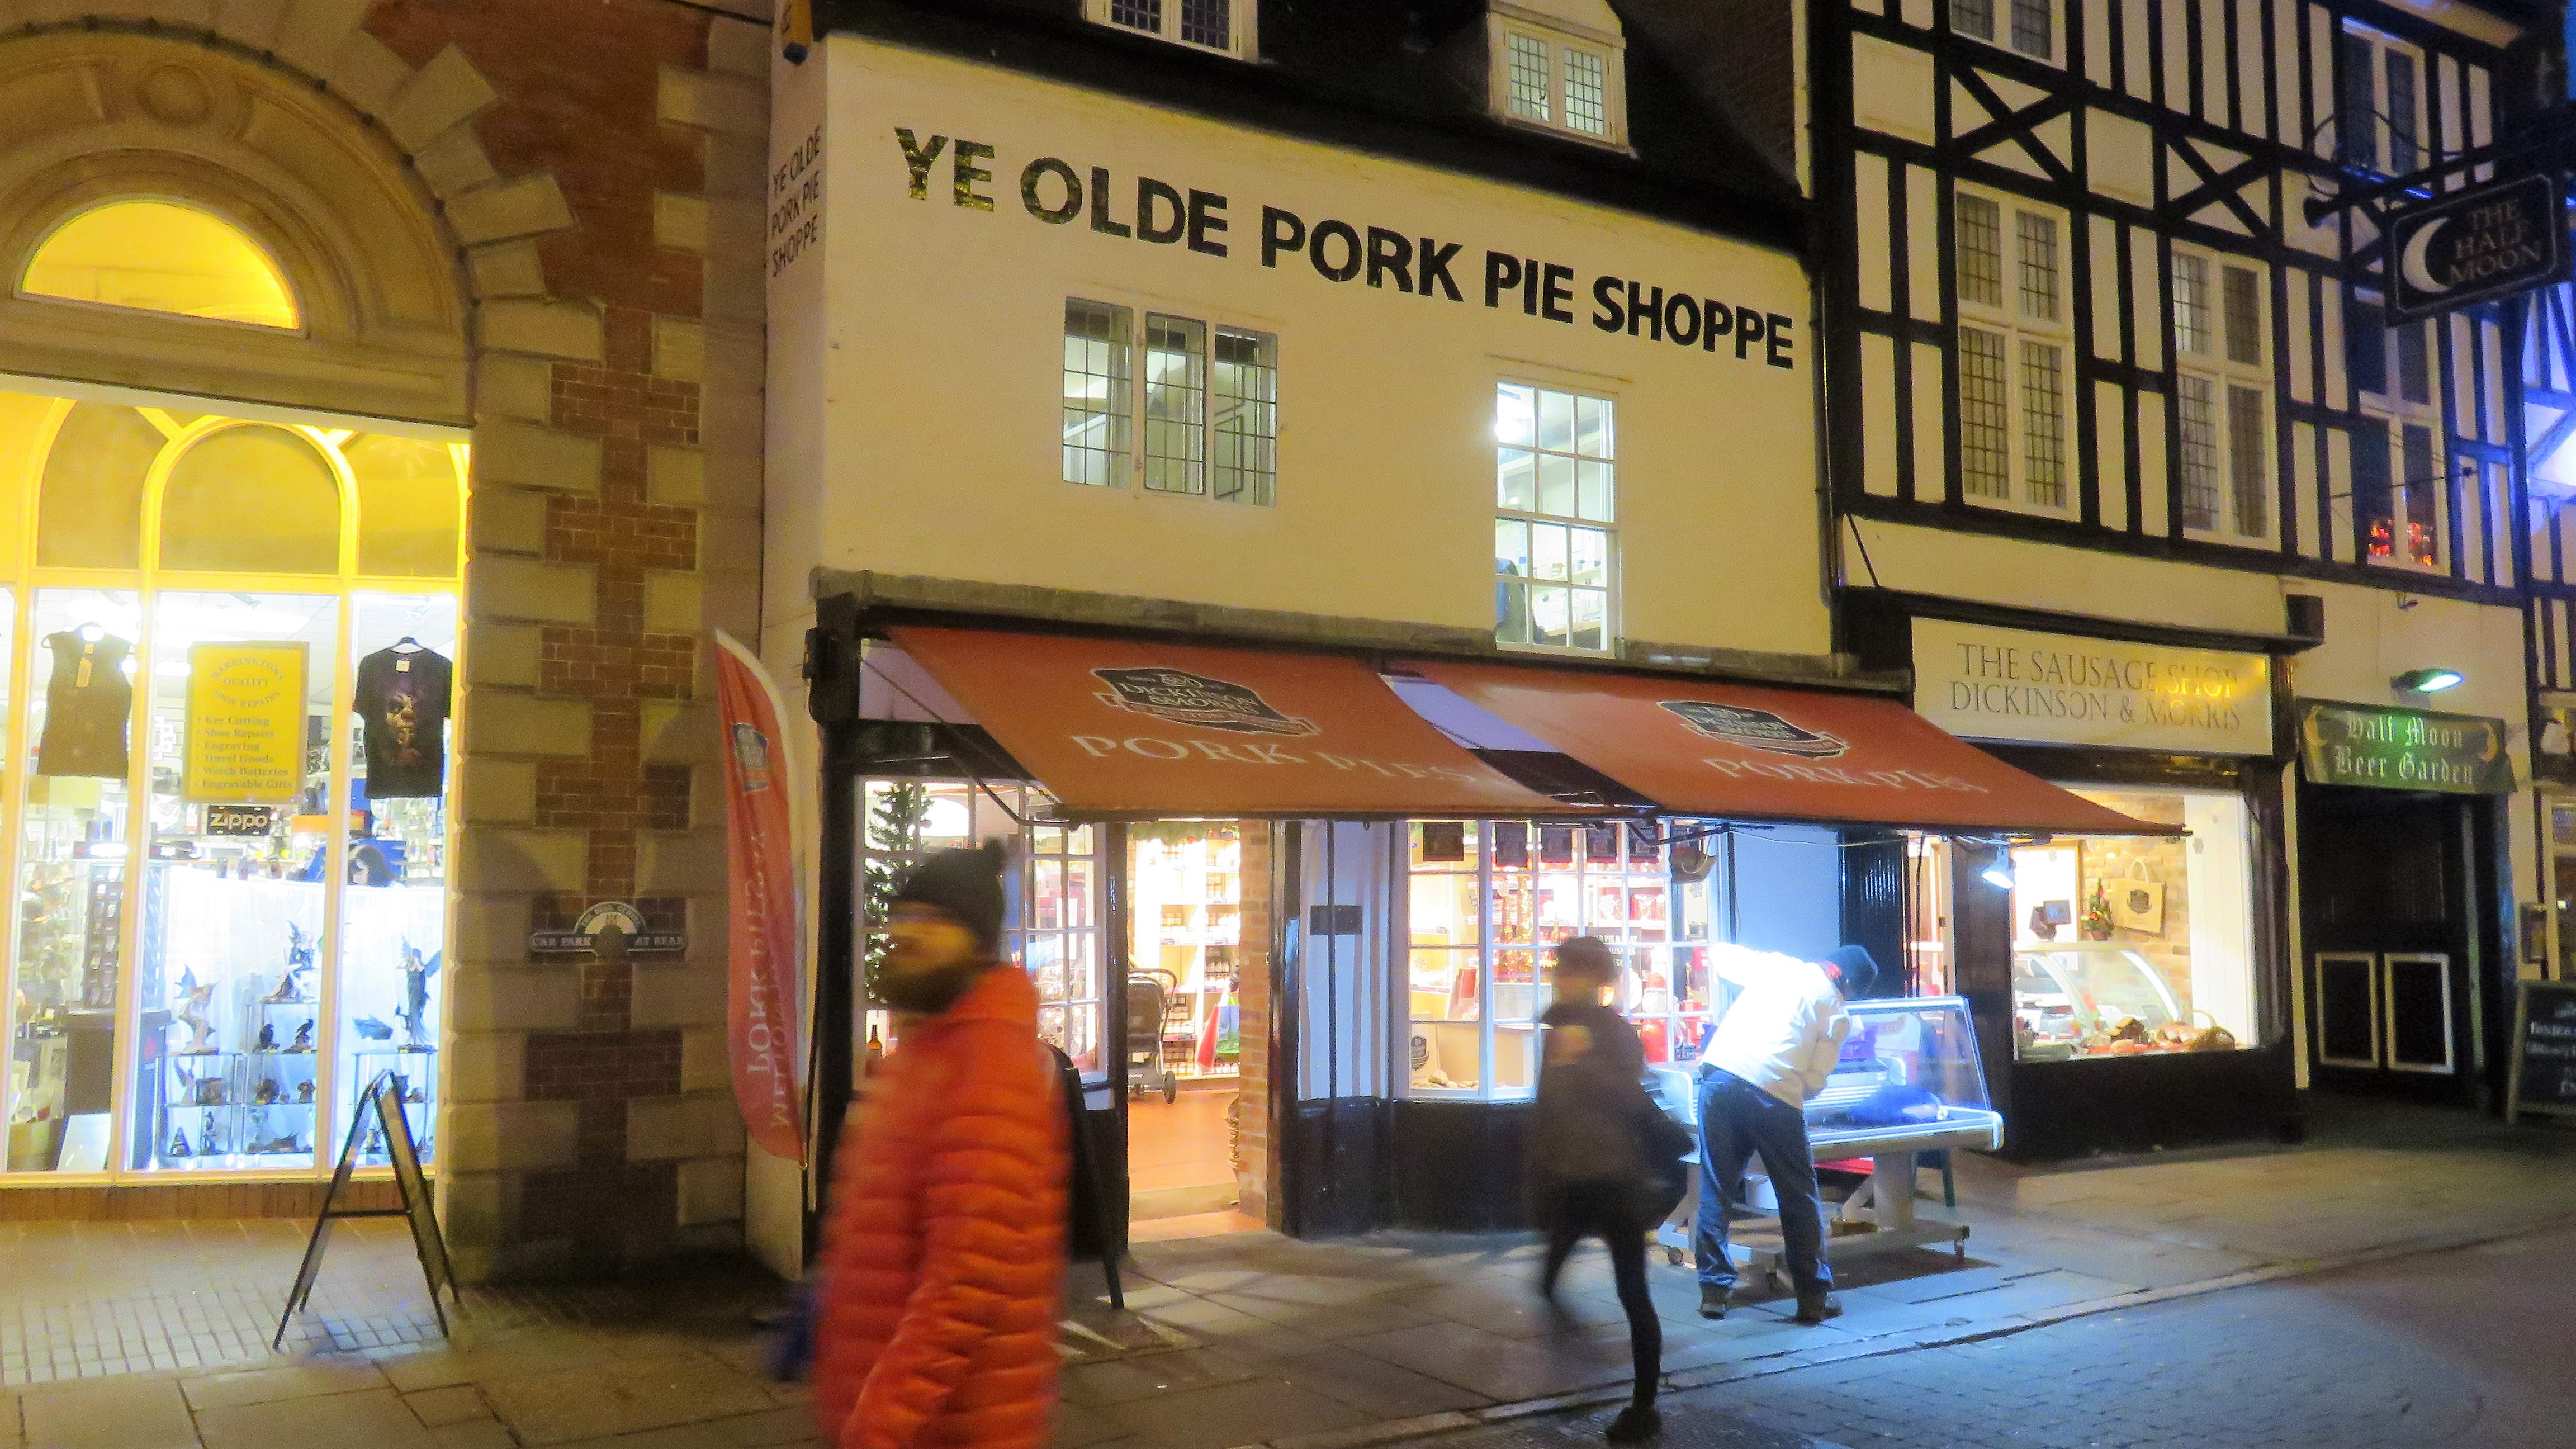 8acbce01a7832 Ye Olde Pork Pie Shoppe   derrickjknight